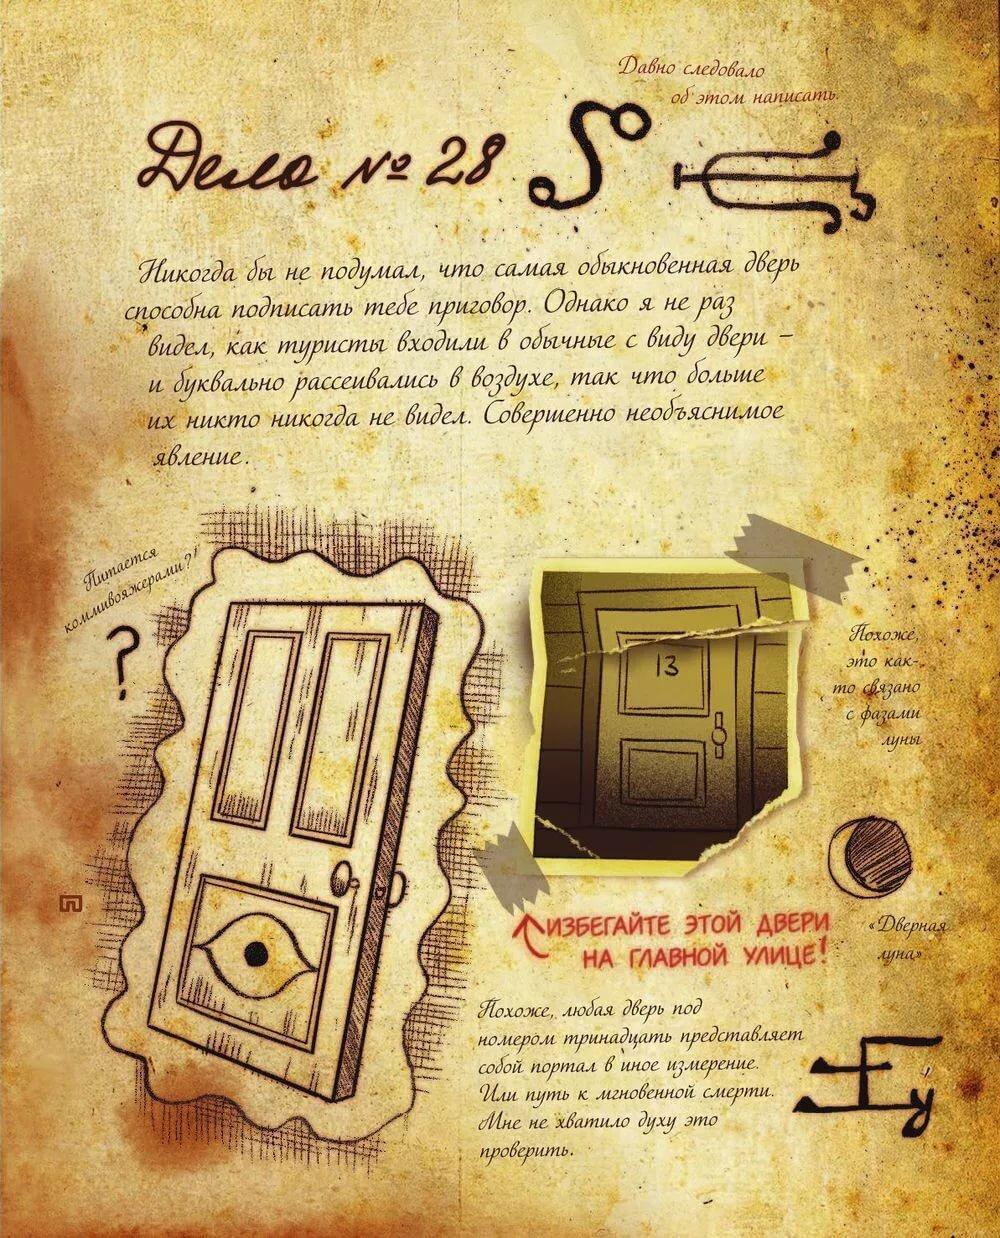 дневник диппера из гравити фолз картинки тагил давно оценил